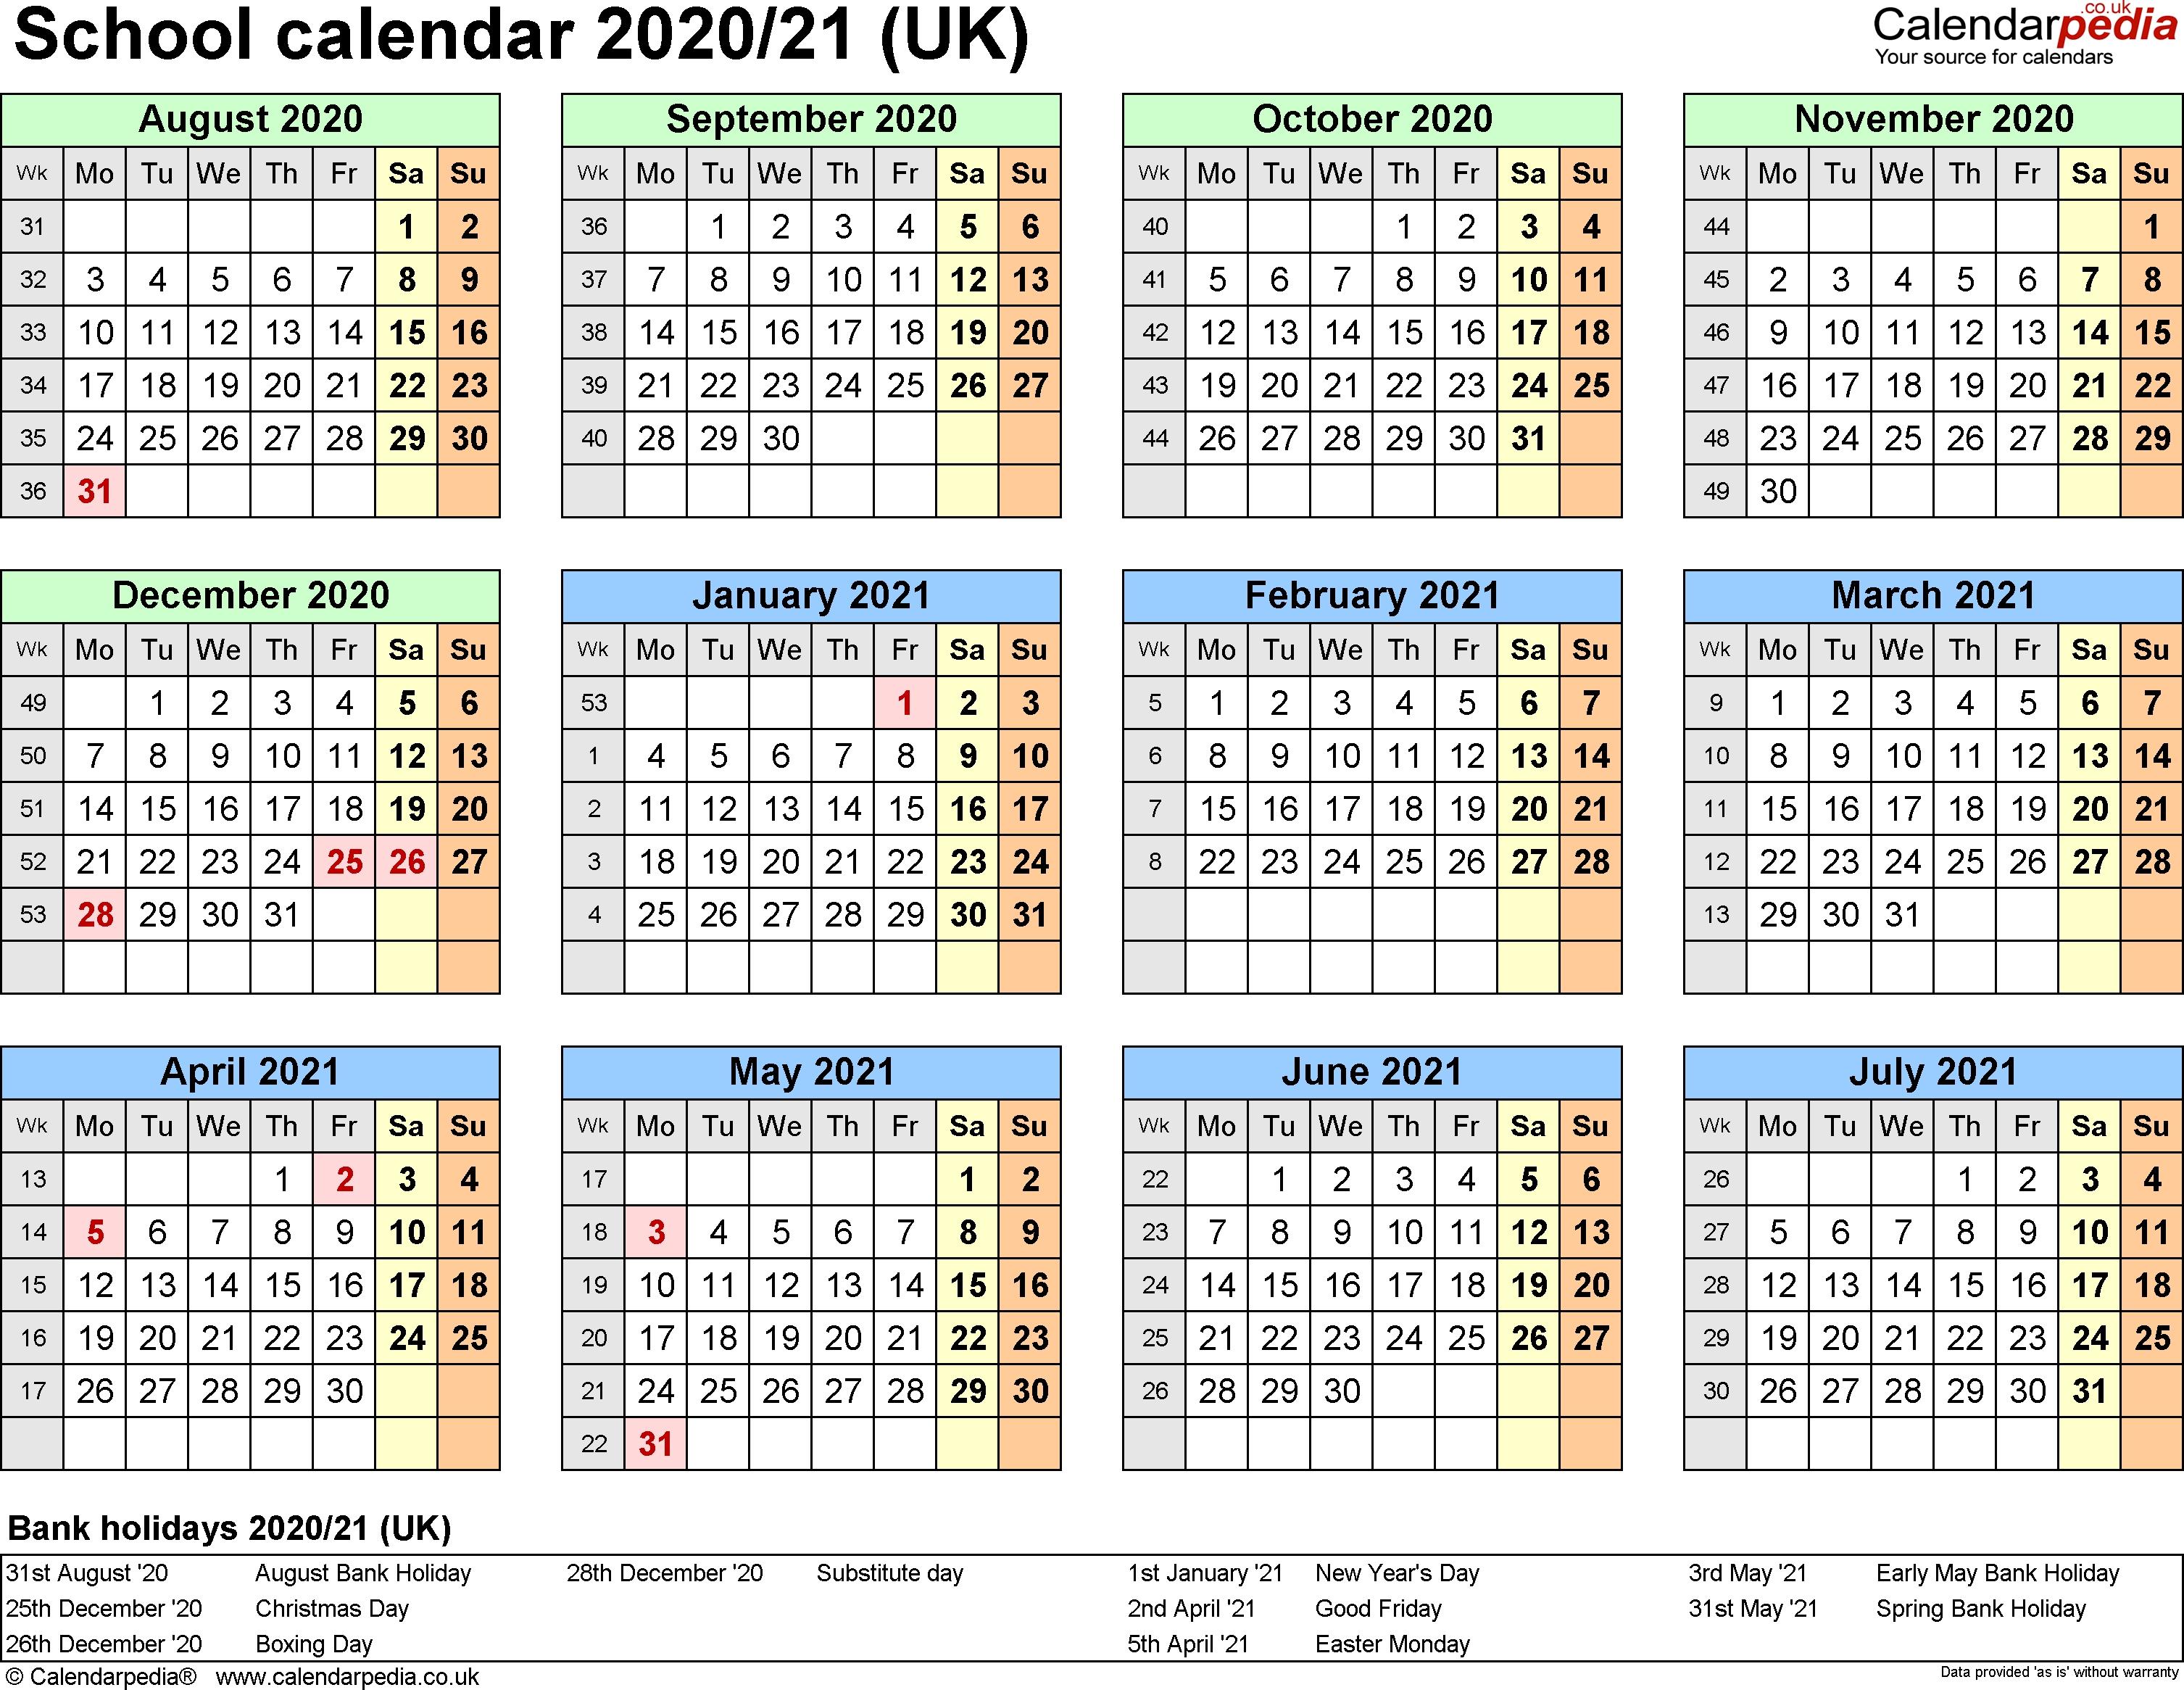 School Calendars 2020/2021 As Free Printable Pdf Templates_Calendar School Usa 2020